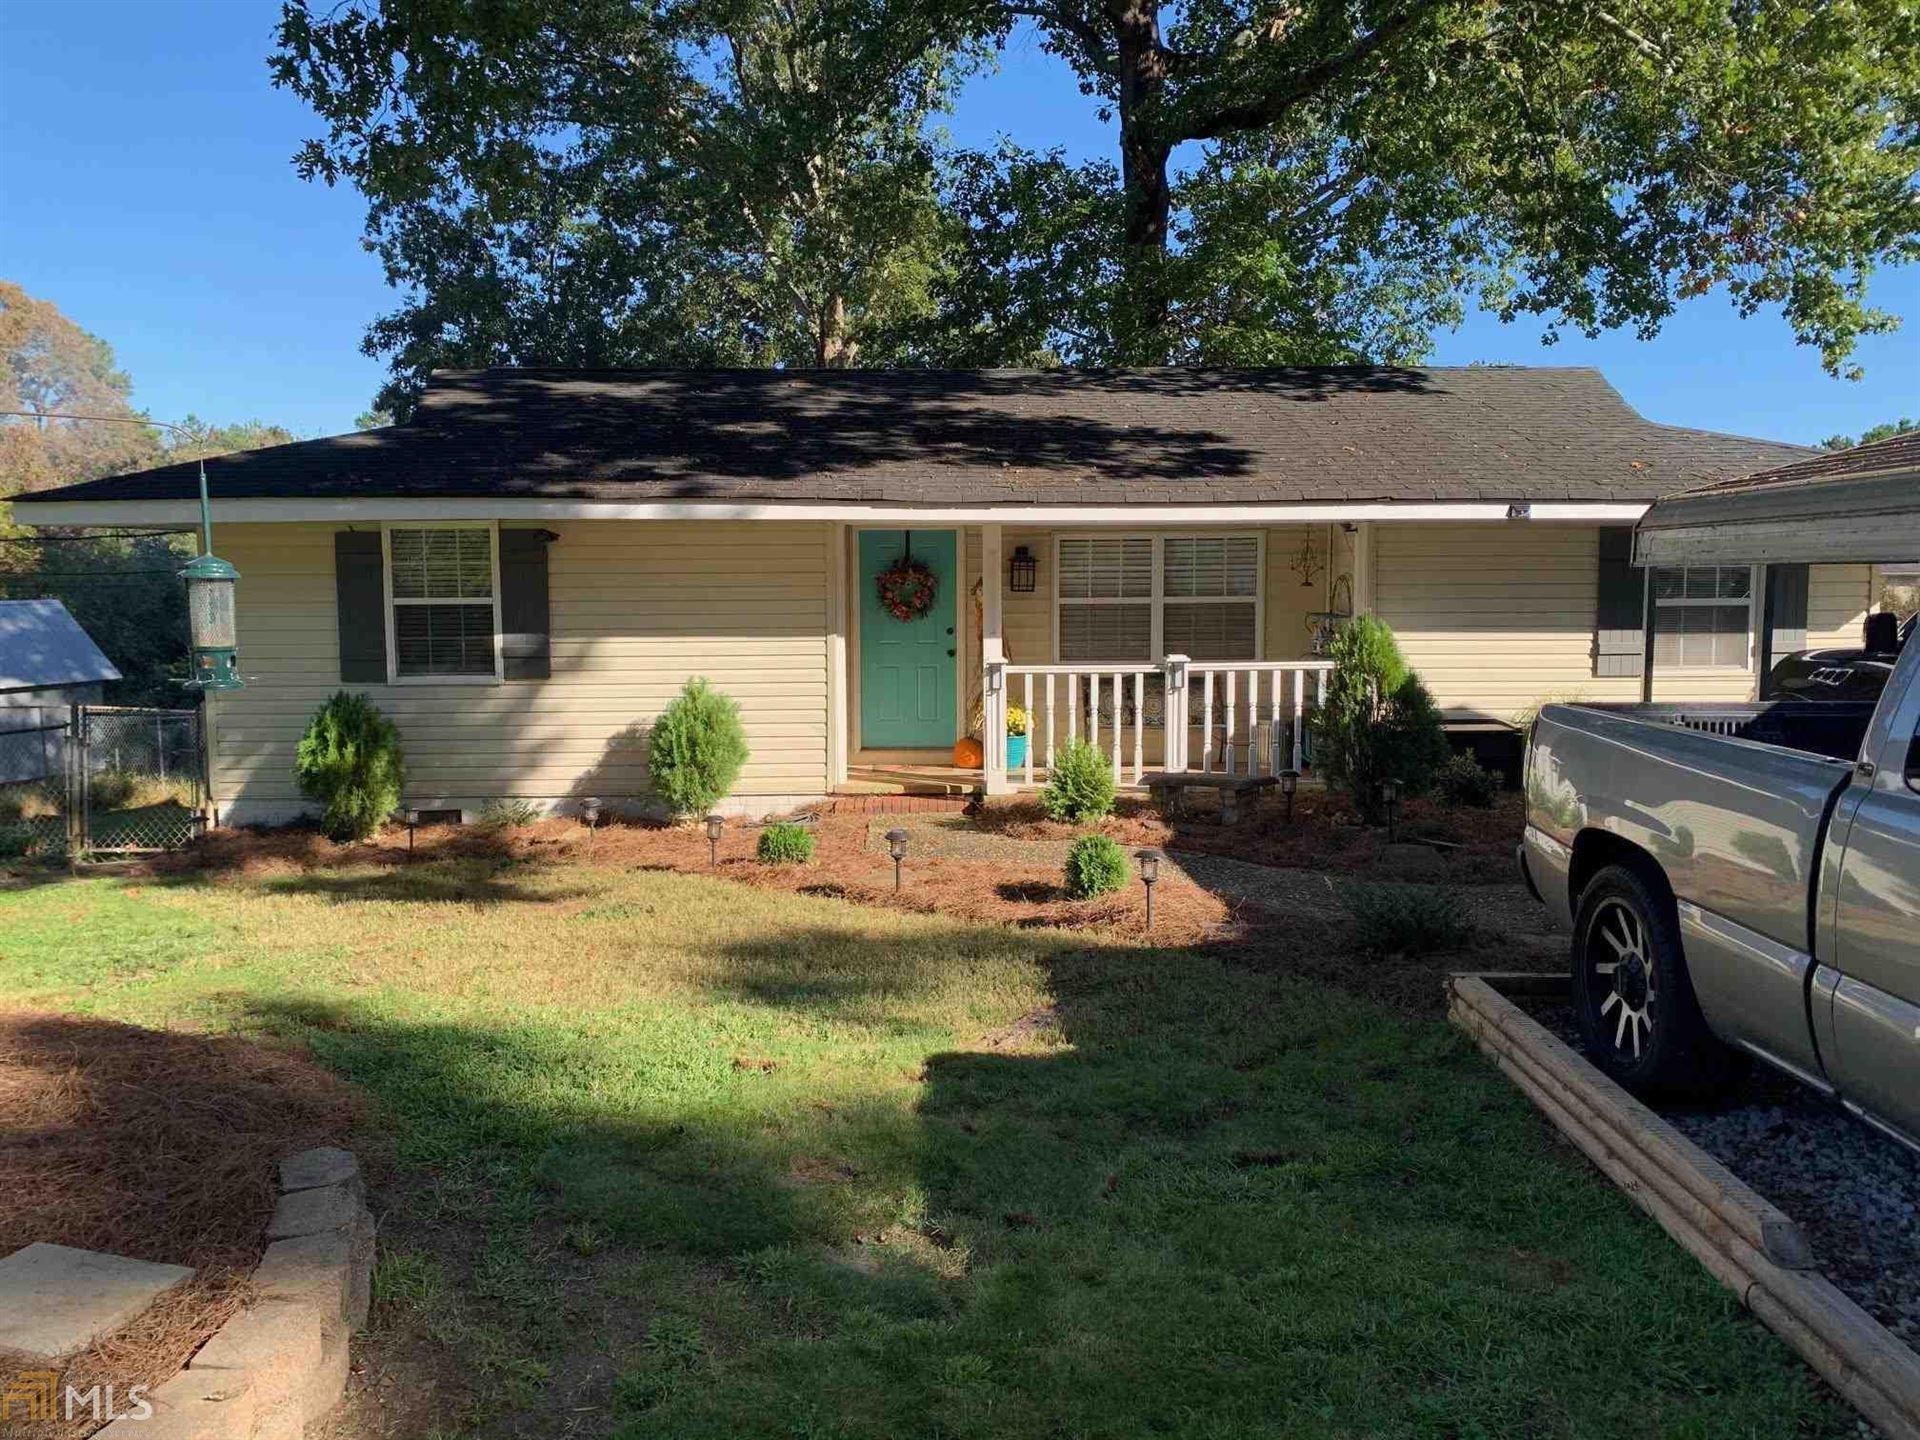 2923 Cowpoke, Gainesville, GA 30507 - MLS#: 8873967